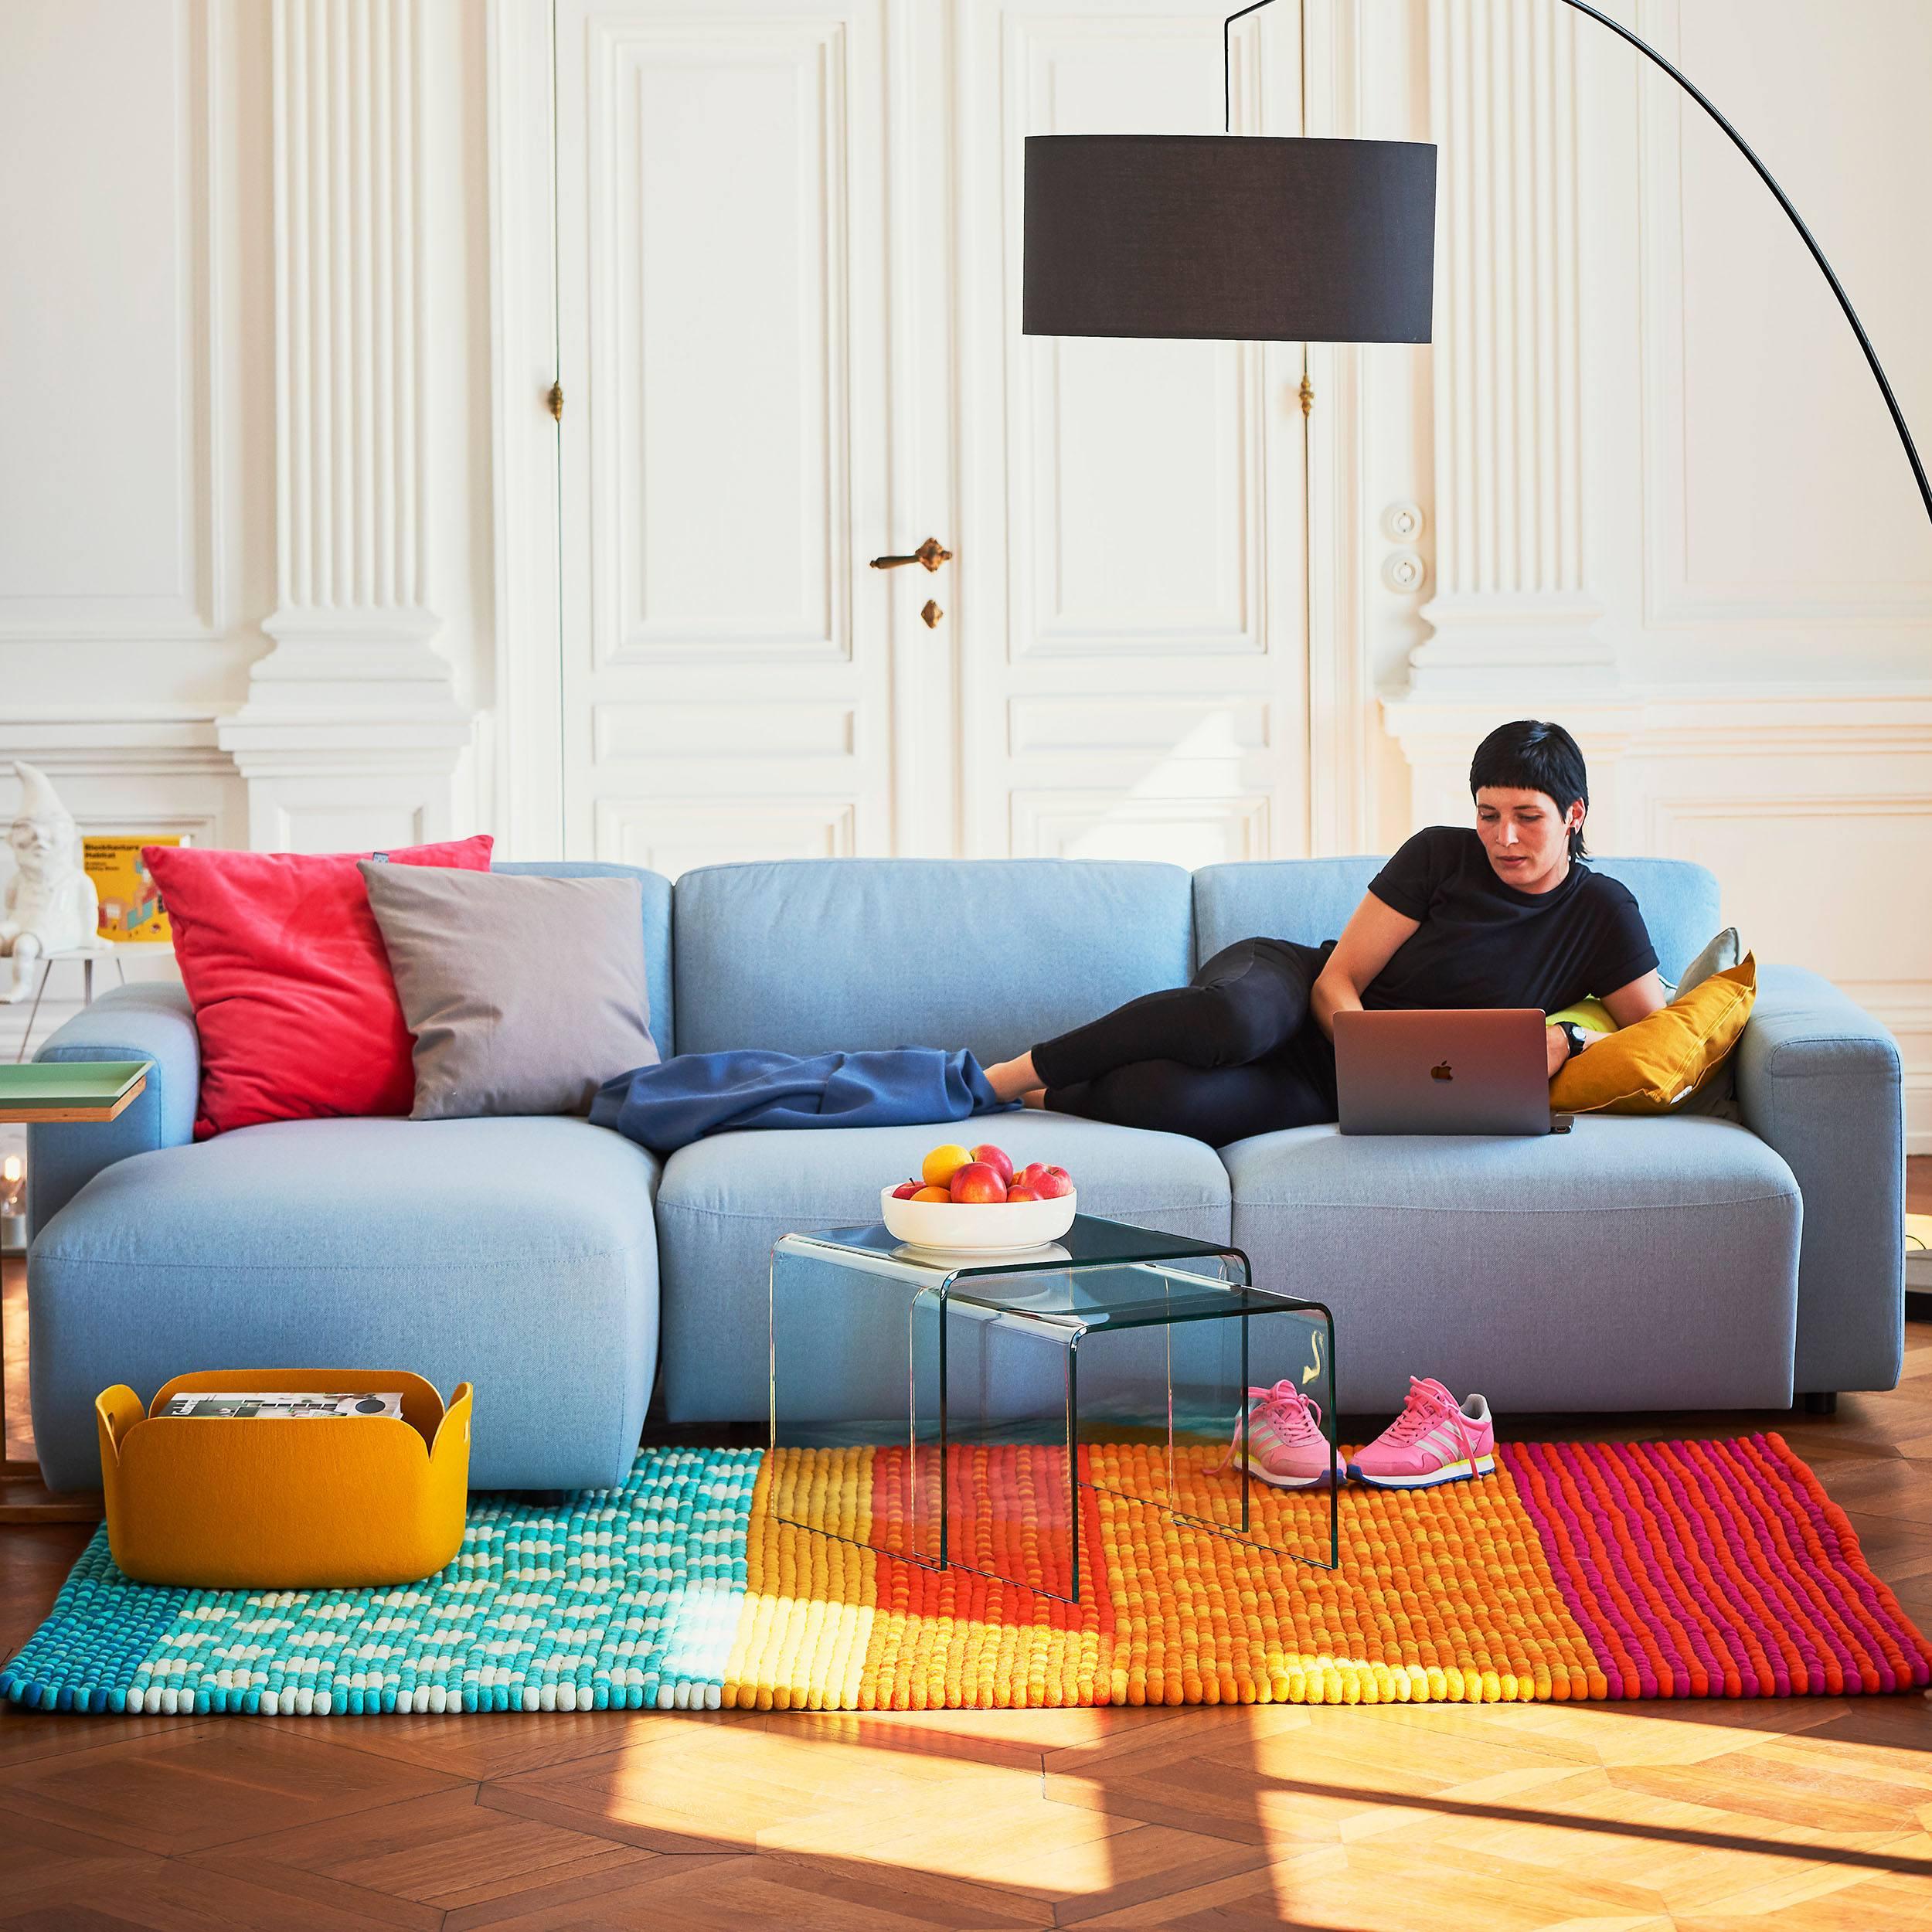 Clifden 3-Sitzer Sofa mit Longchair links